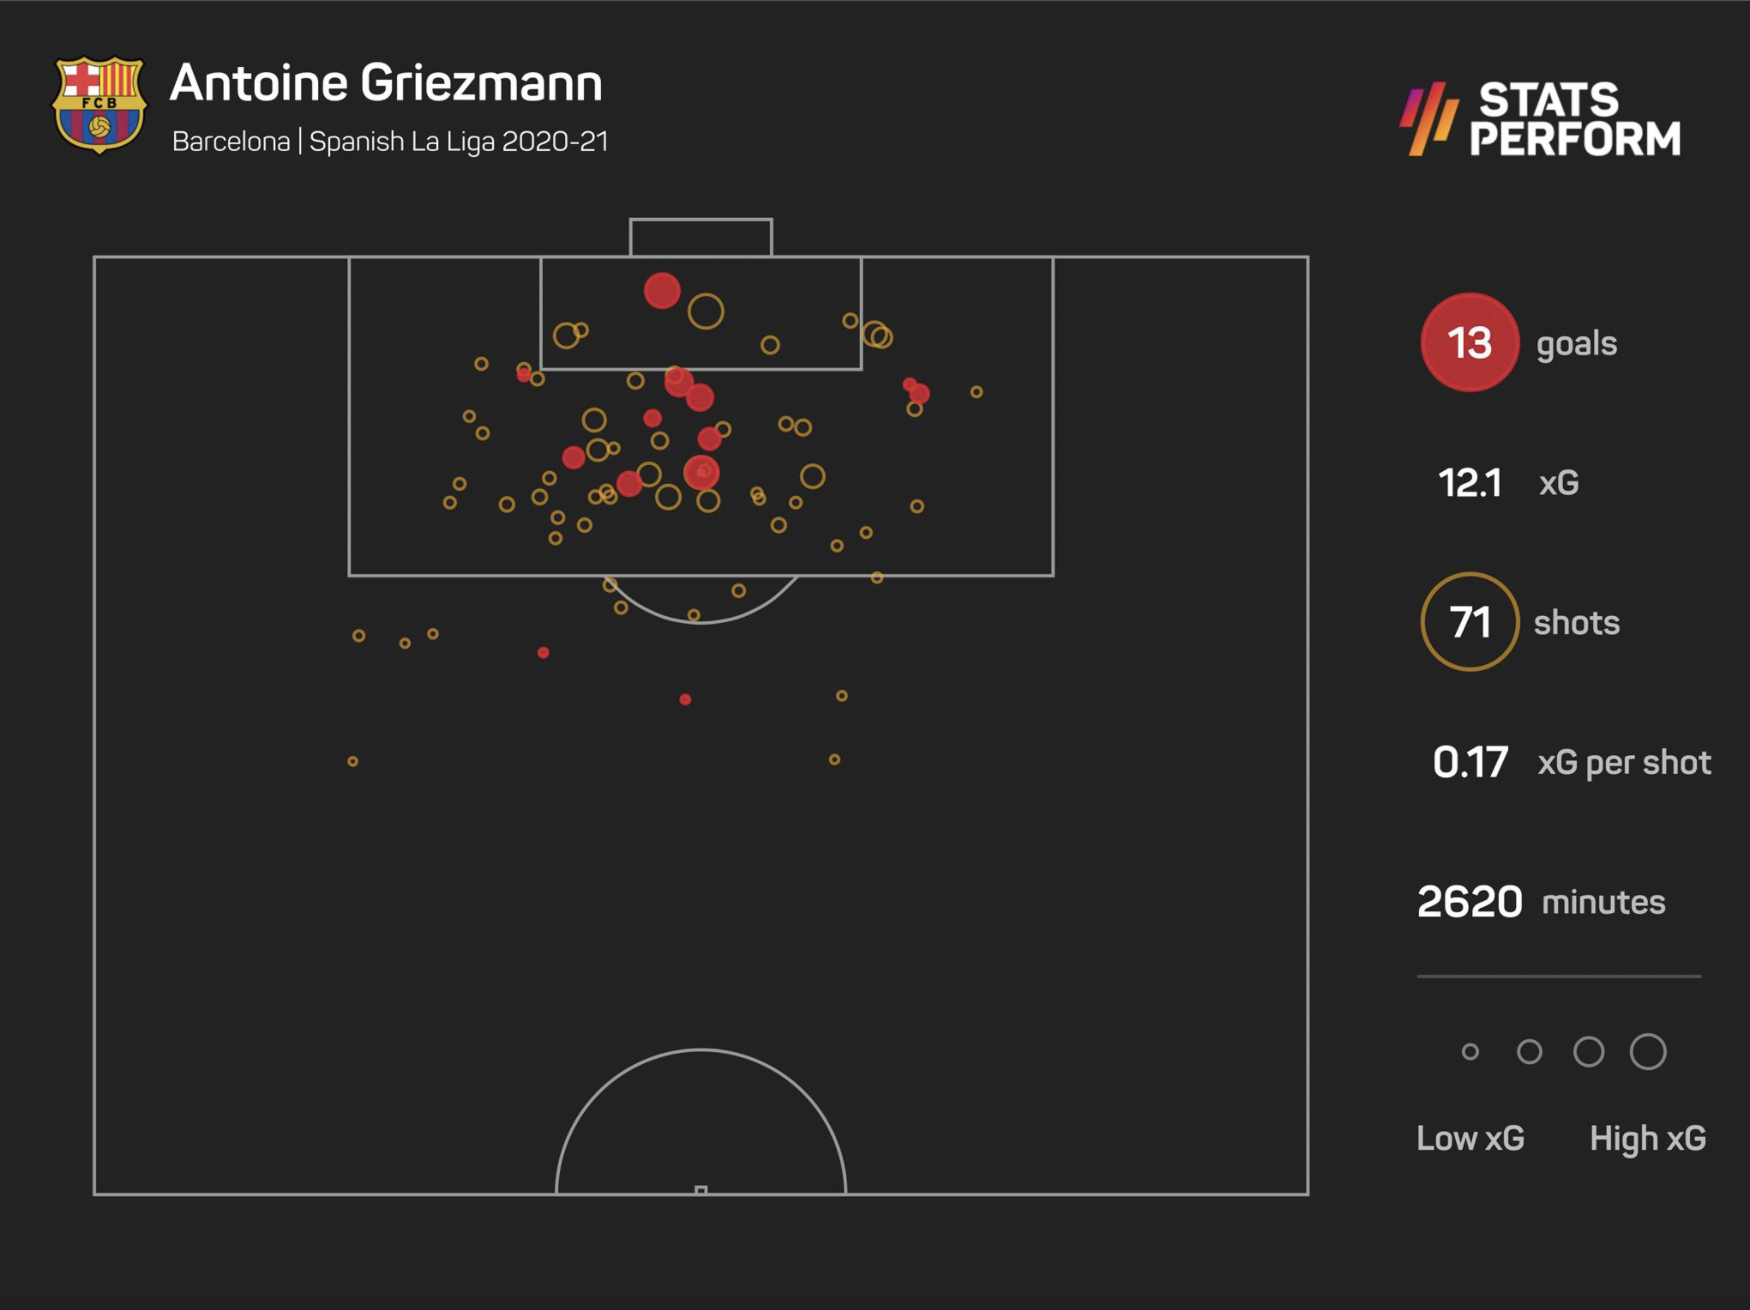 Antoine Griezmann scored 13 goals in LaLiga last season